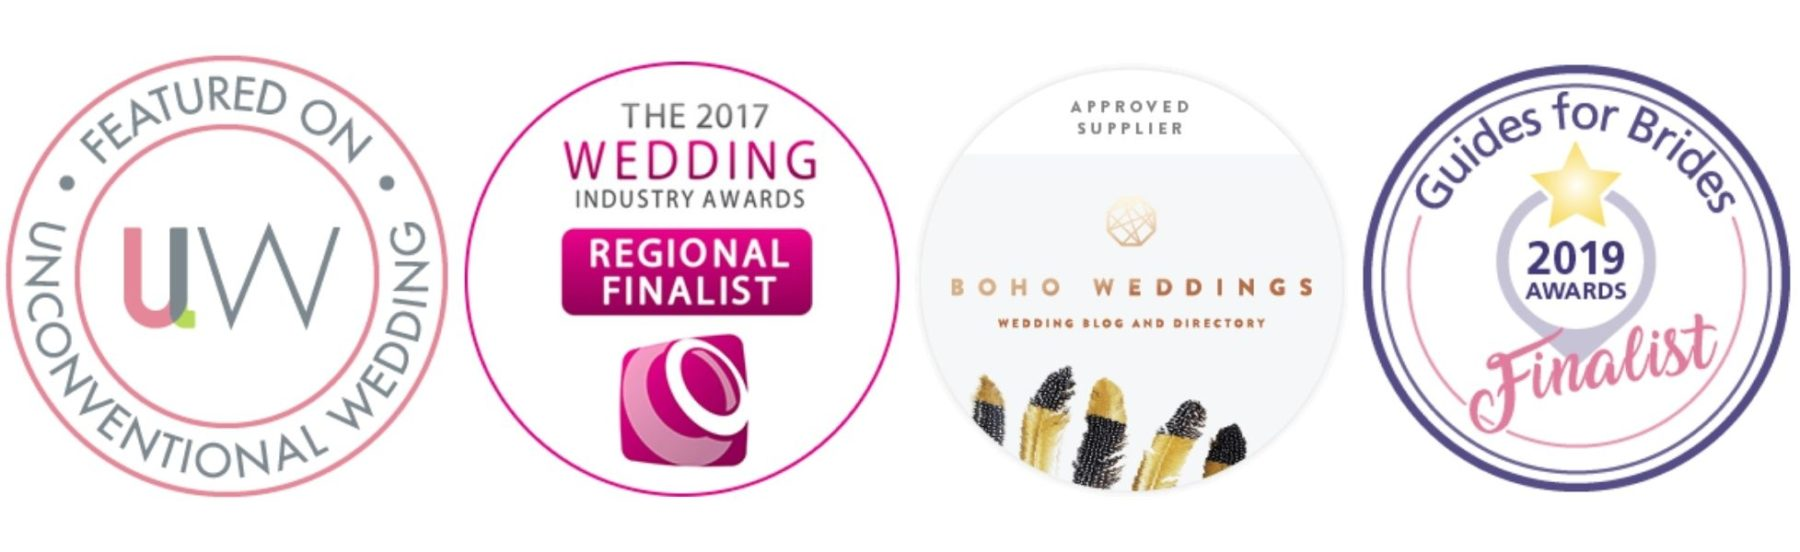 PR on Unconventional Wedding